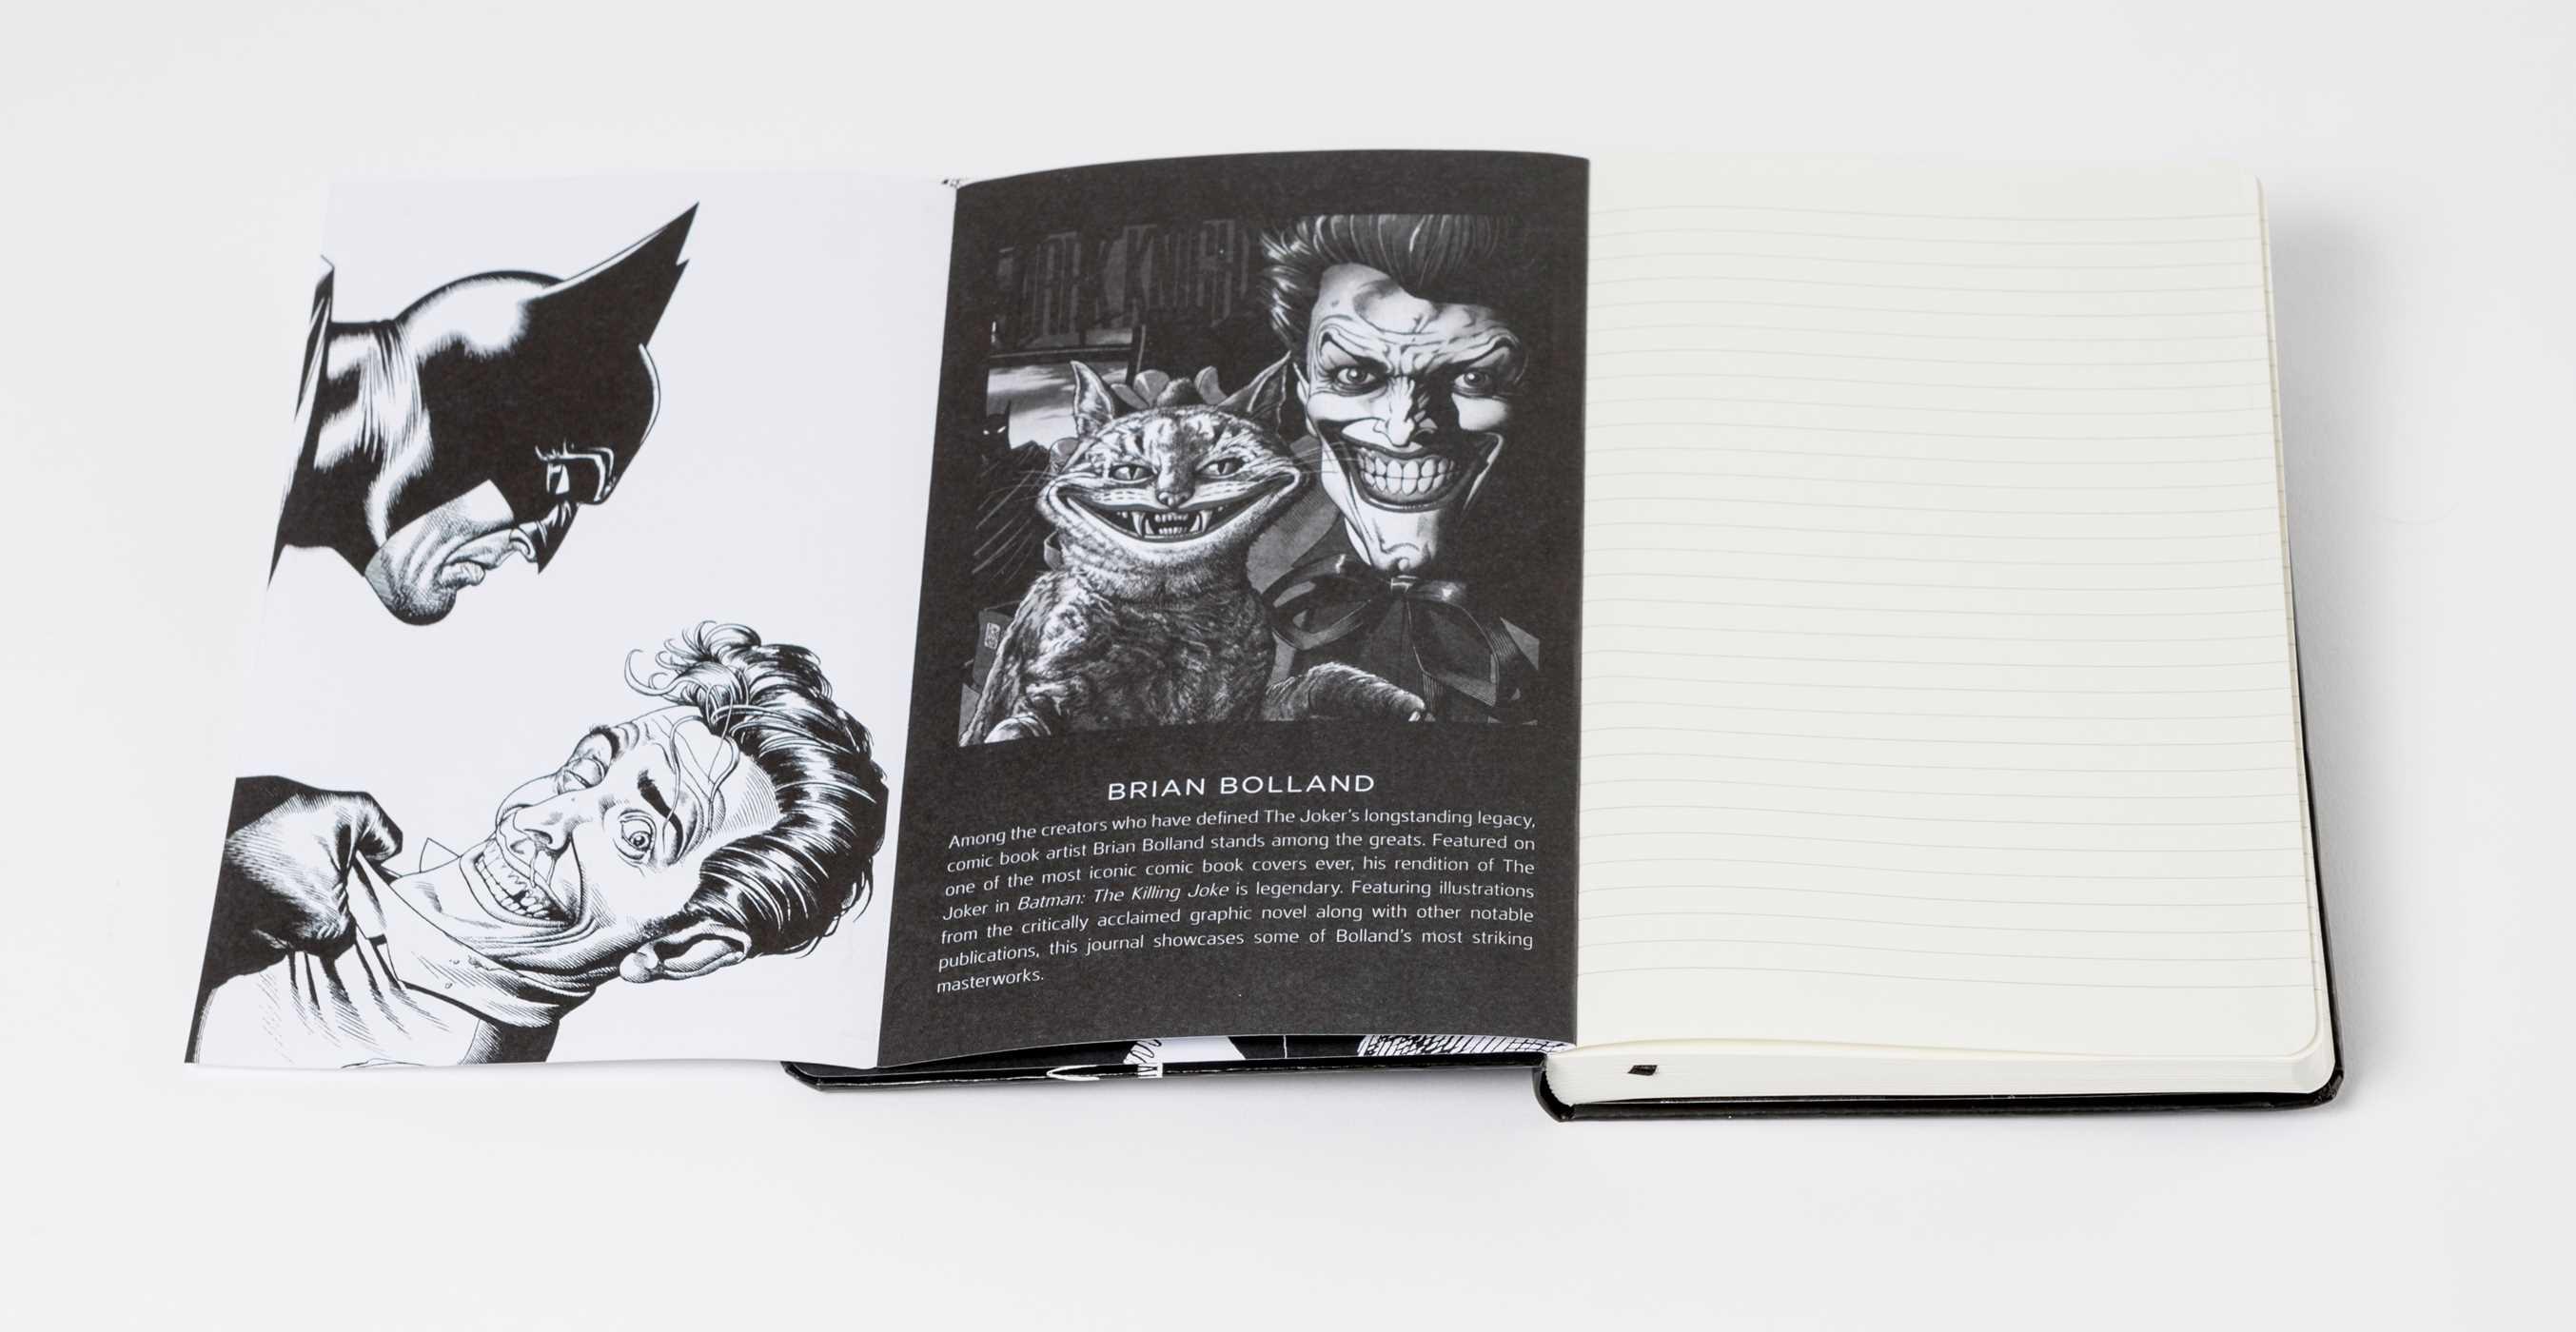 Dc comics the joker hardcover ruled journal artist edition 9781683833307.in07